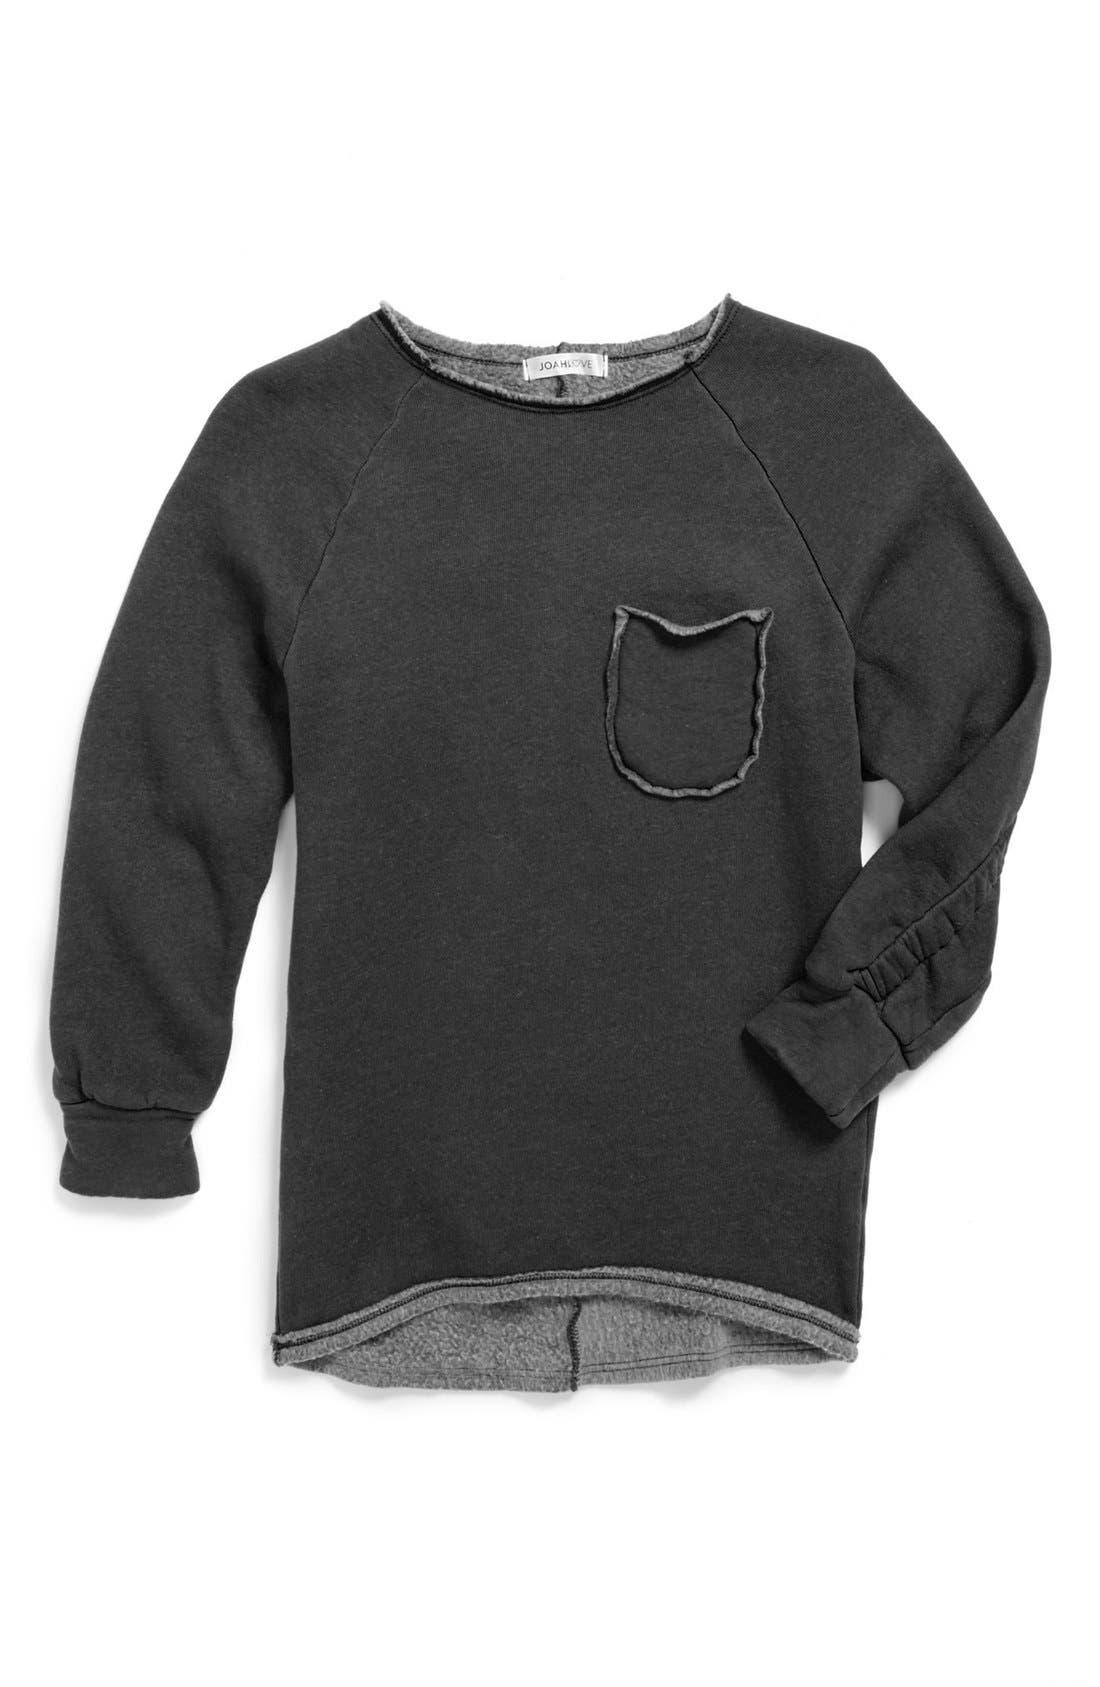 Alternate Image 1 Selected - Joah Love Pocket Sweatshirt (Little Girls & Big Girls)